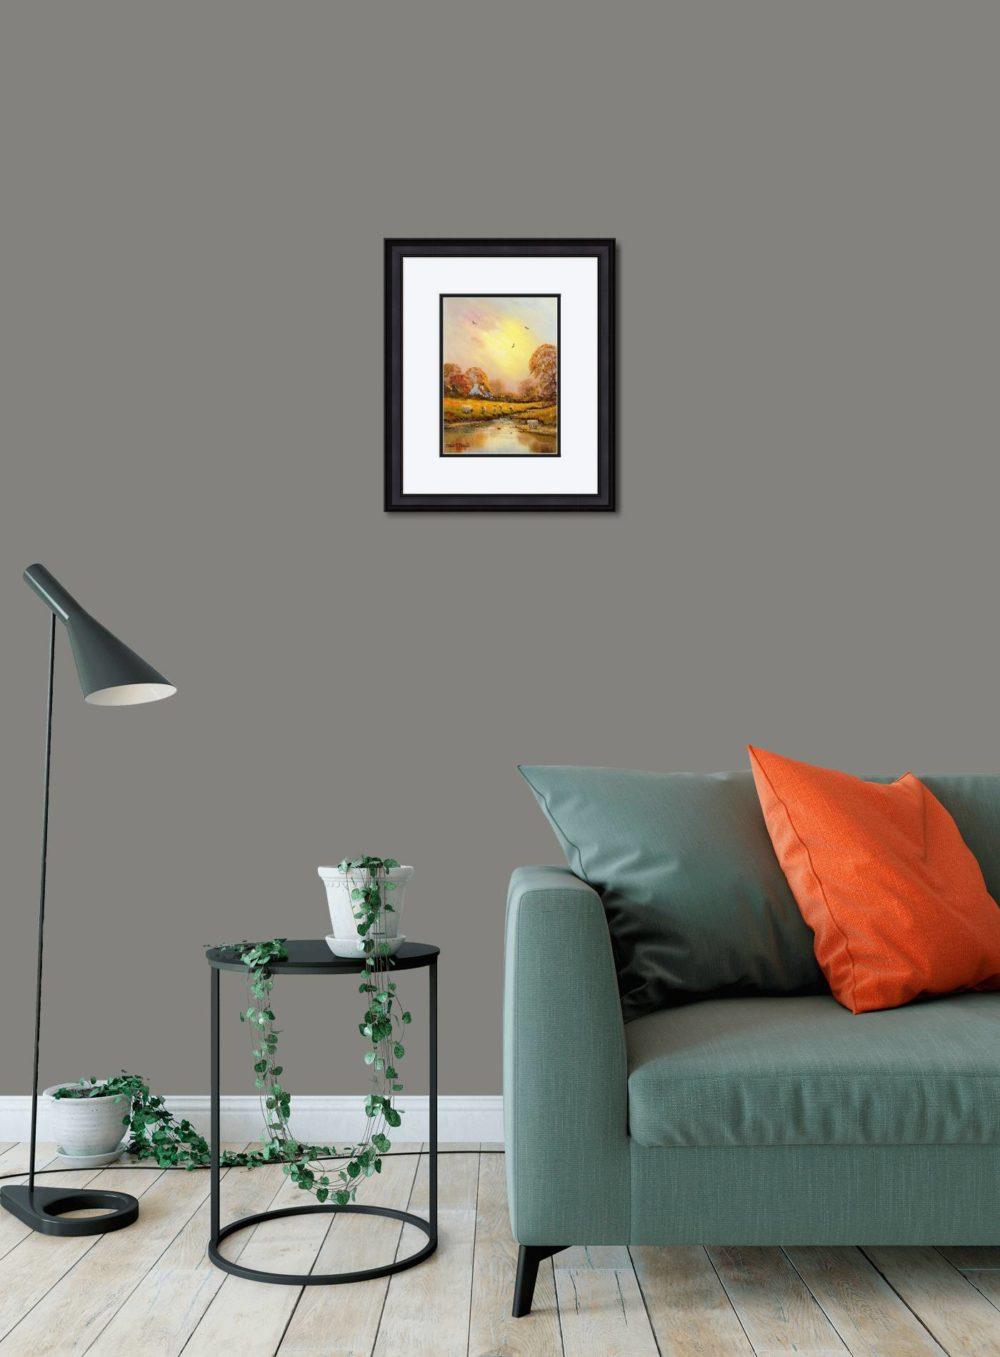 Autumn Stream Print (Small) in Black Frame in Room